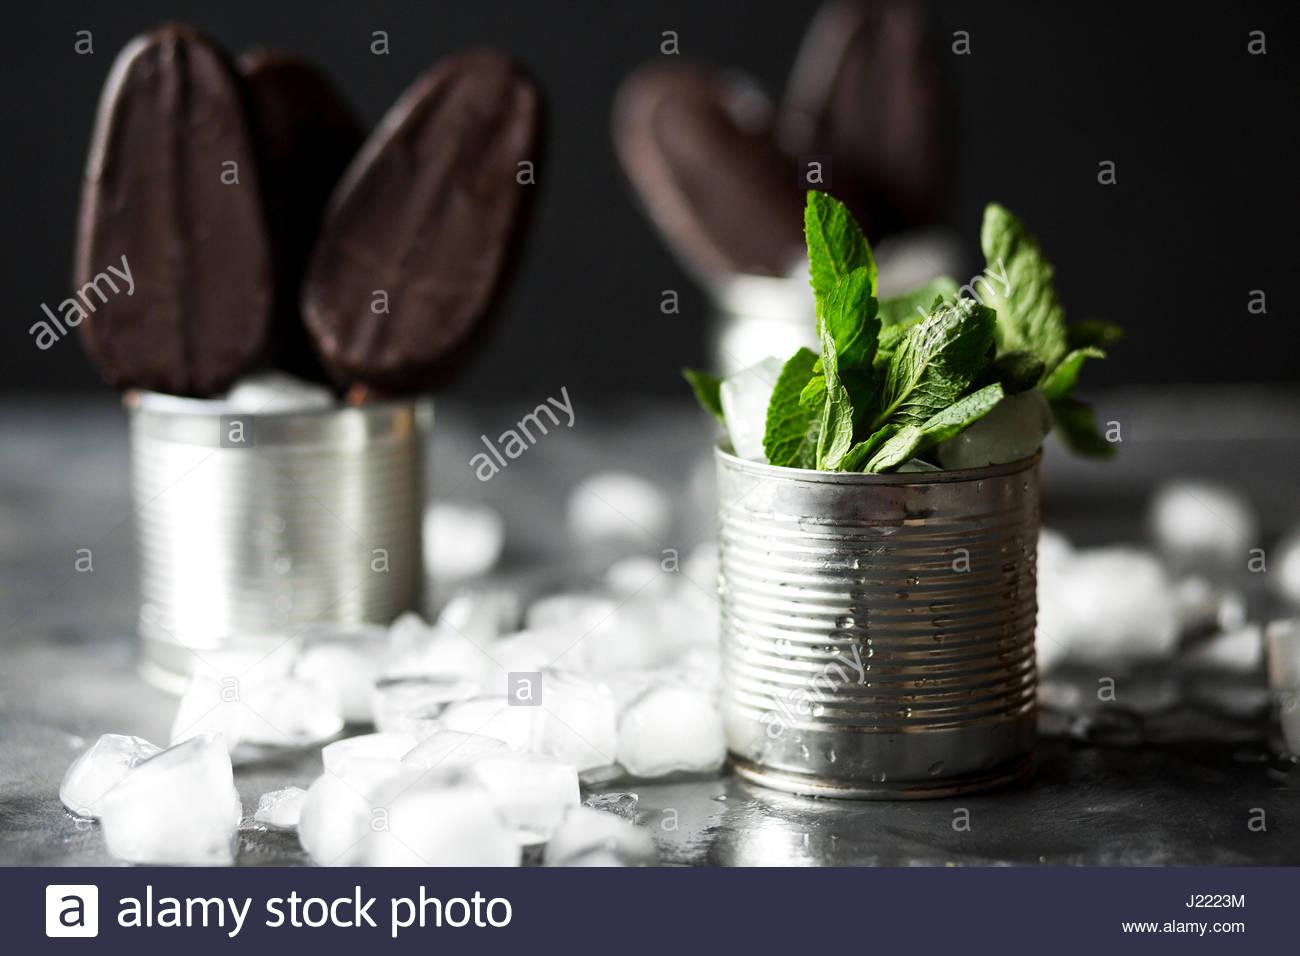 Chocolate ice cream on a stick in an iron jar on a black background. Chocolate dessert. Ice. Fresh mint Stock Photo